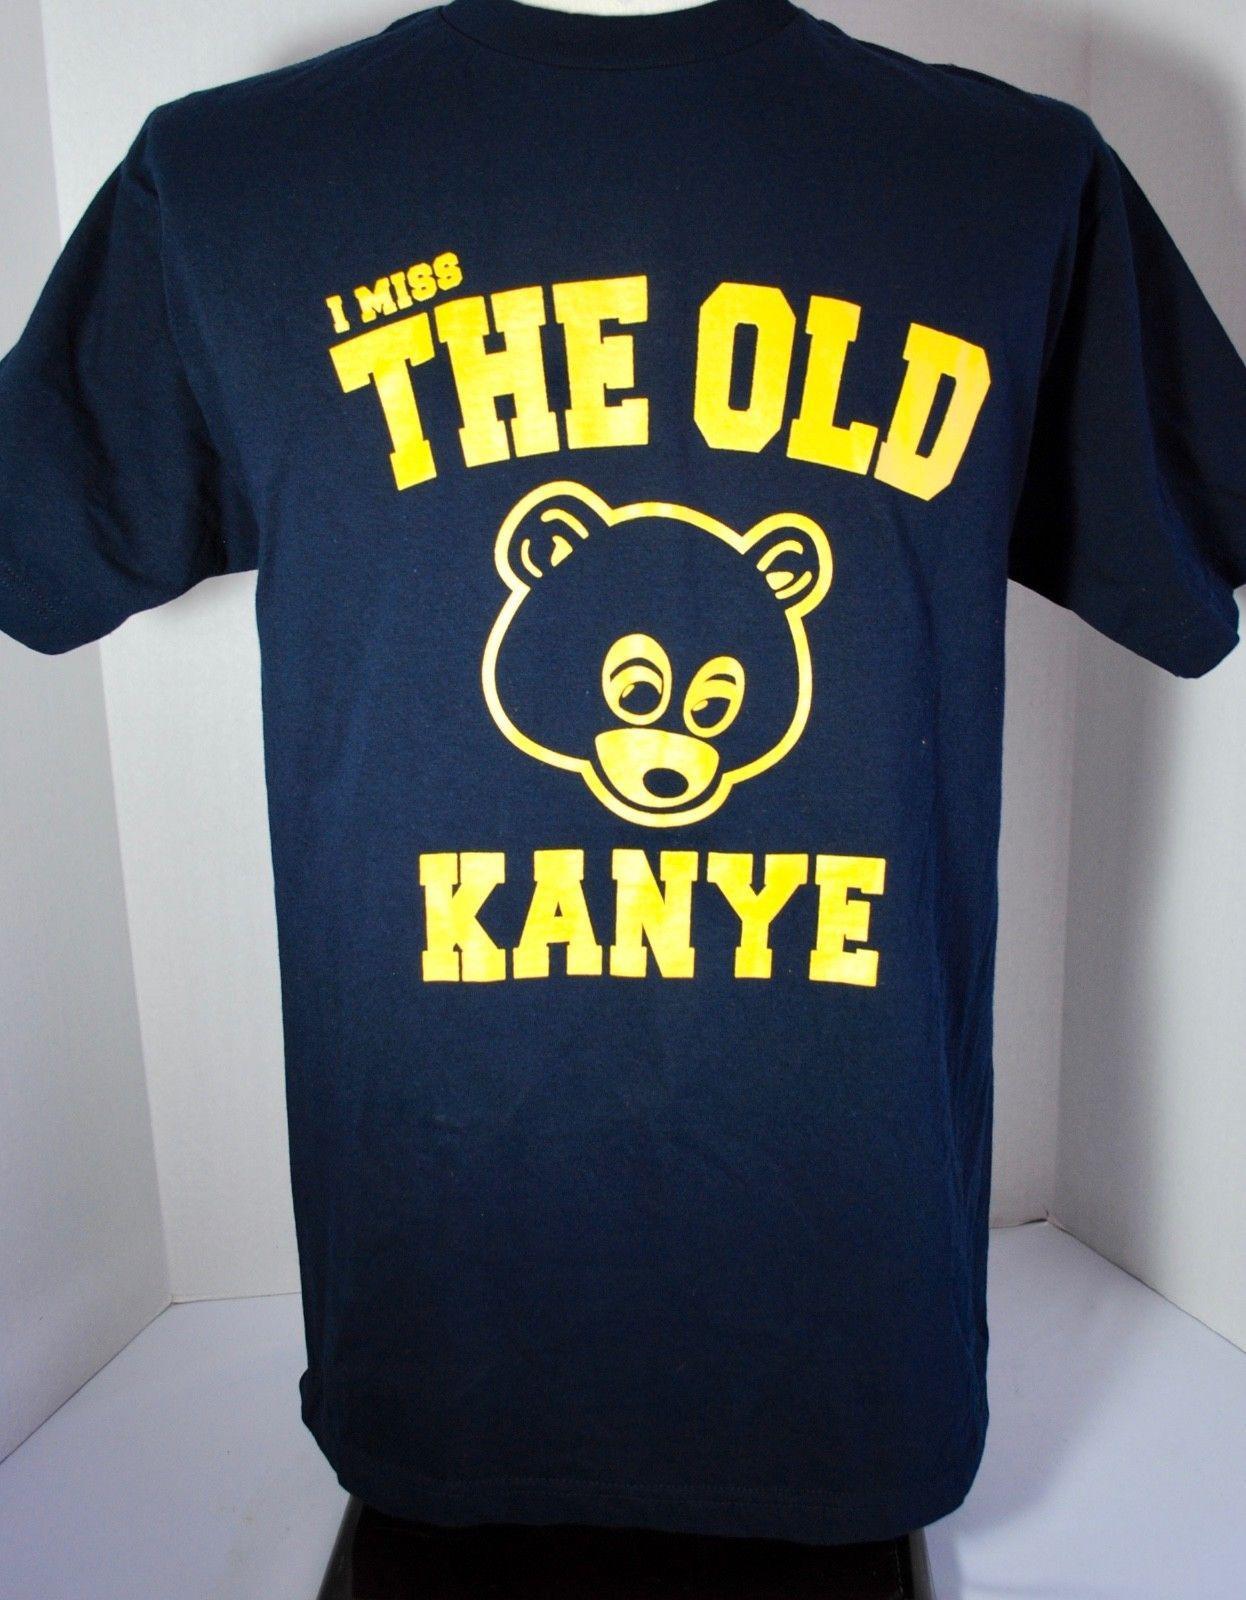 Kanye West T Shirt Miss Old Mens Tee Navy Kim Kardashian Hip HopFunny Unisex Casual Tshirt Top All Order Shirts From Tshirtdoctor